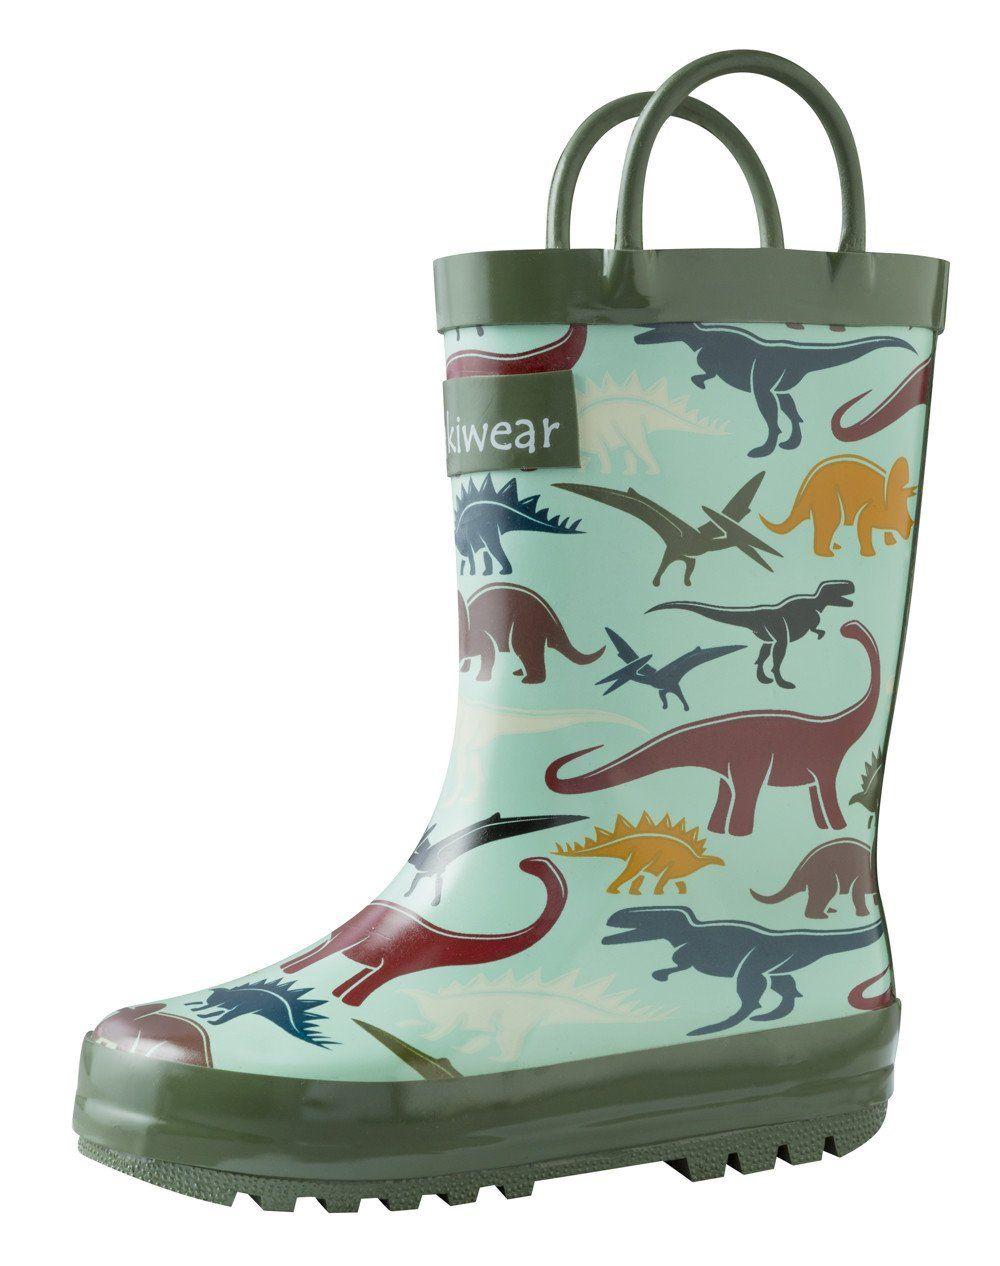 Children's Rubber Rain Boots, Earthy